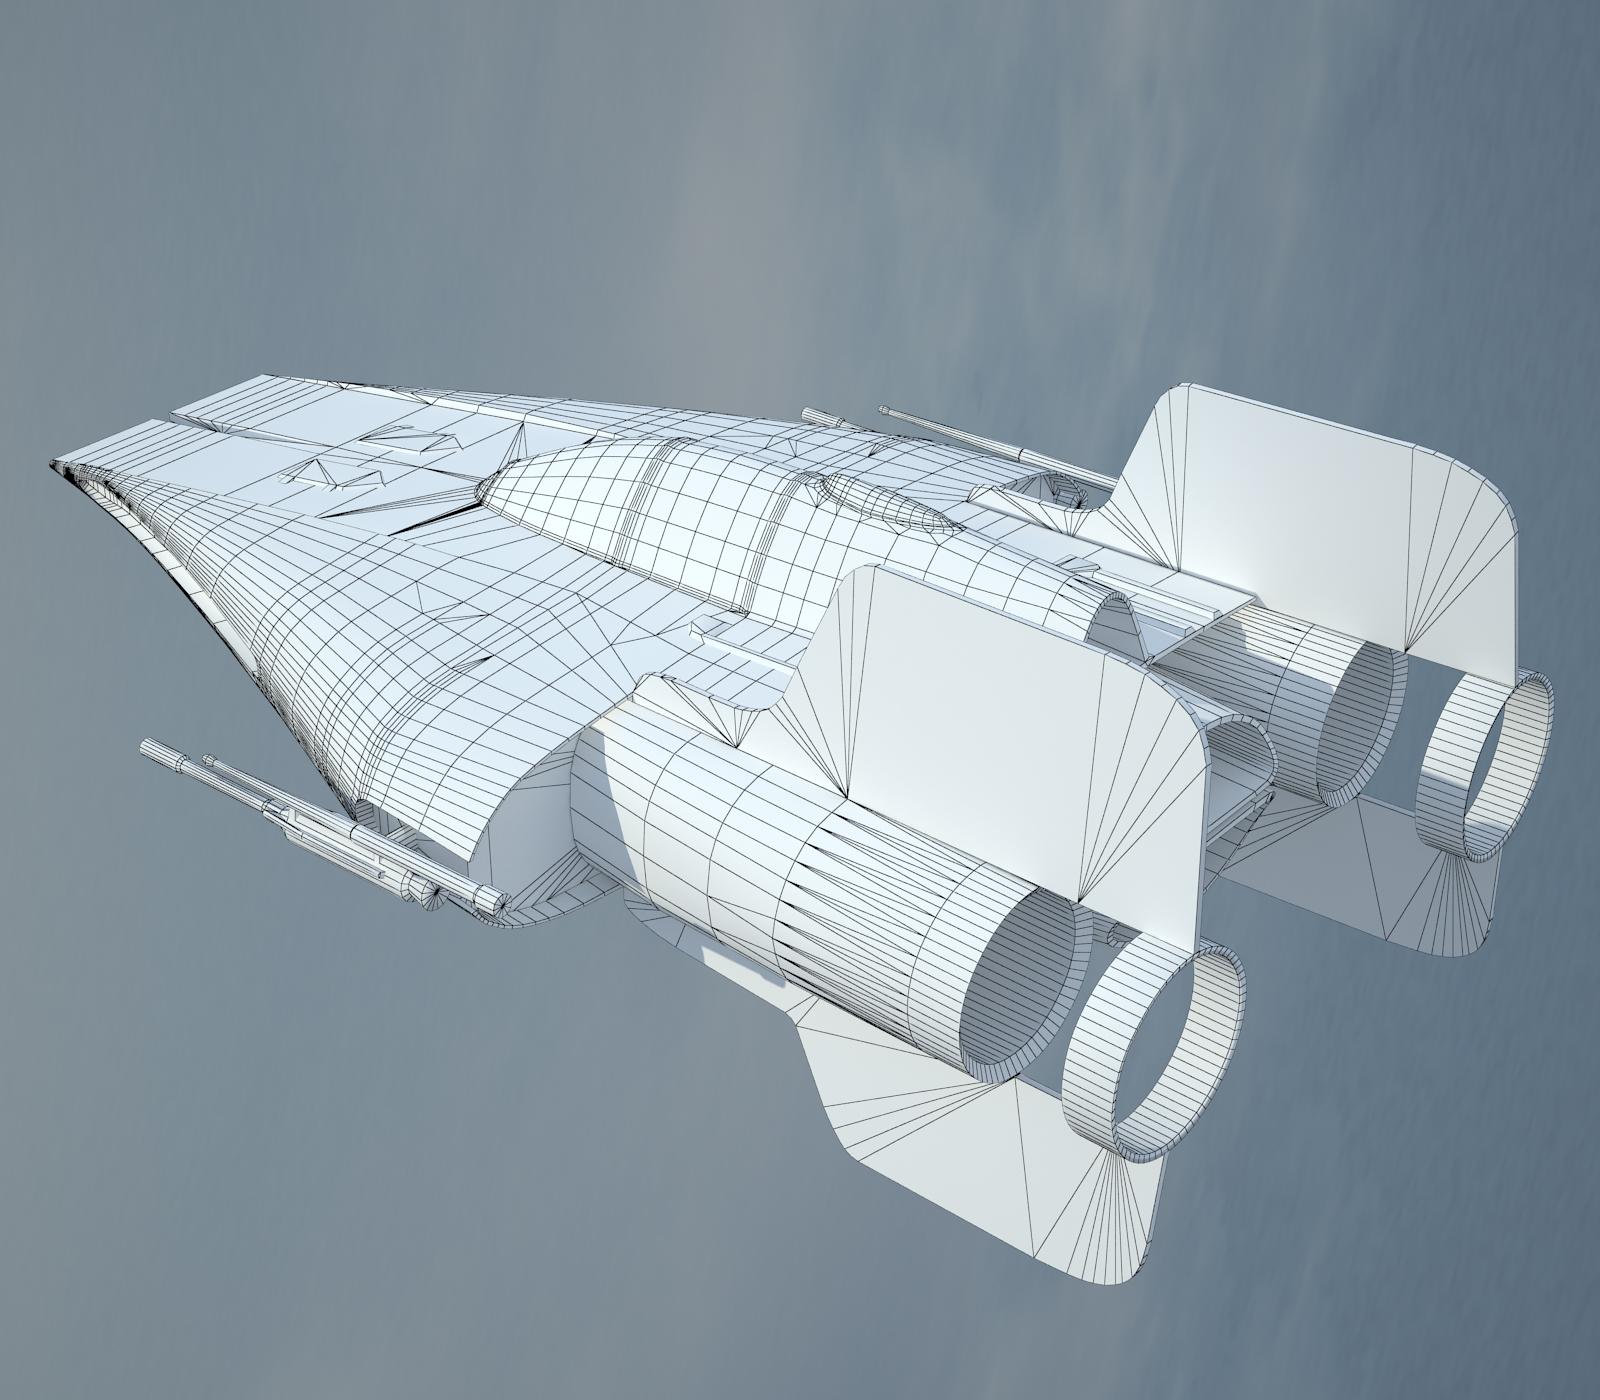 Rz 1 A Wing Interceptor